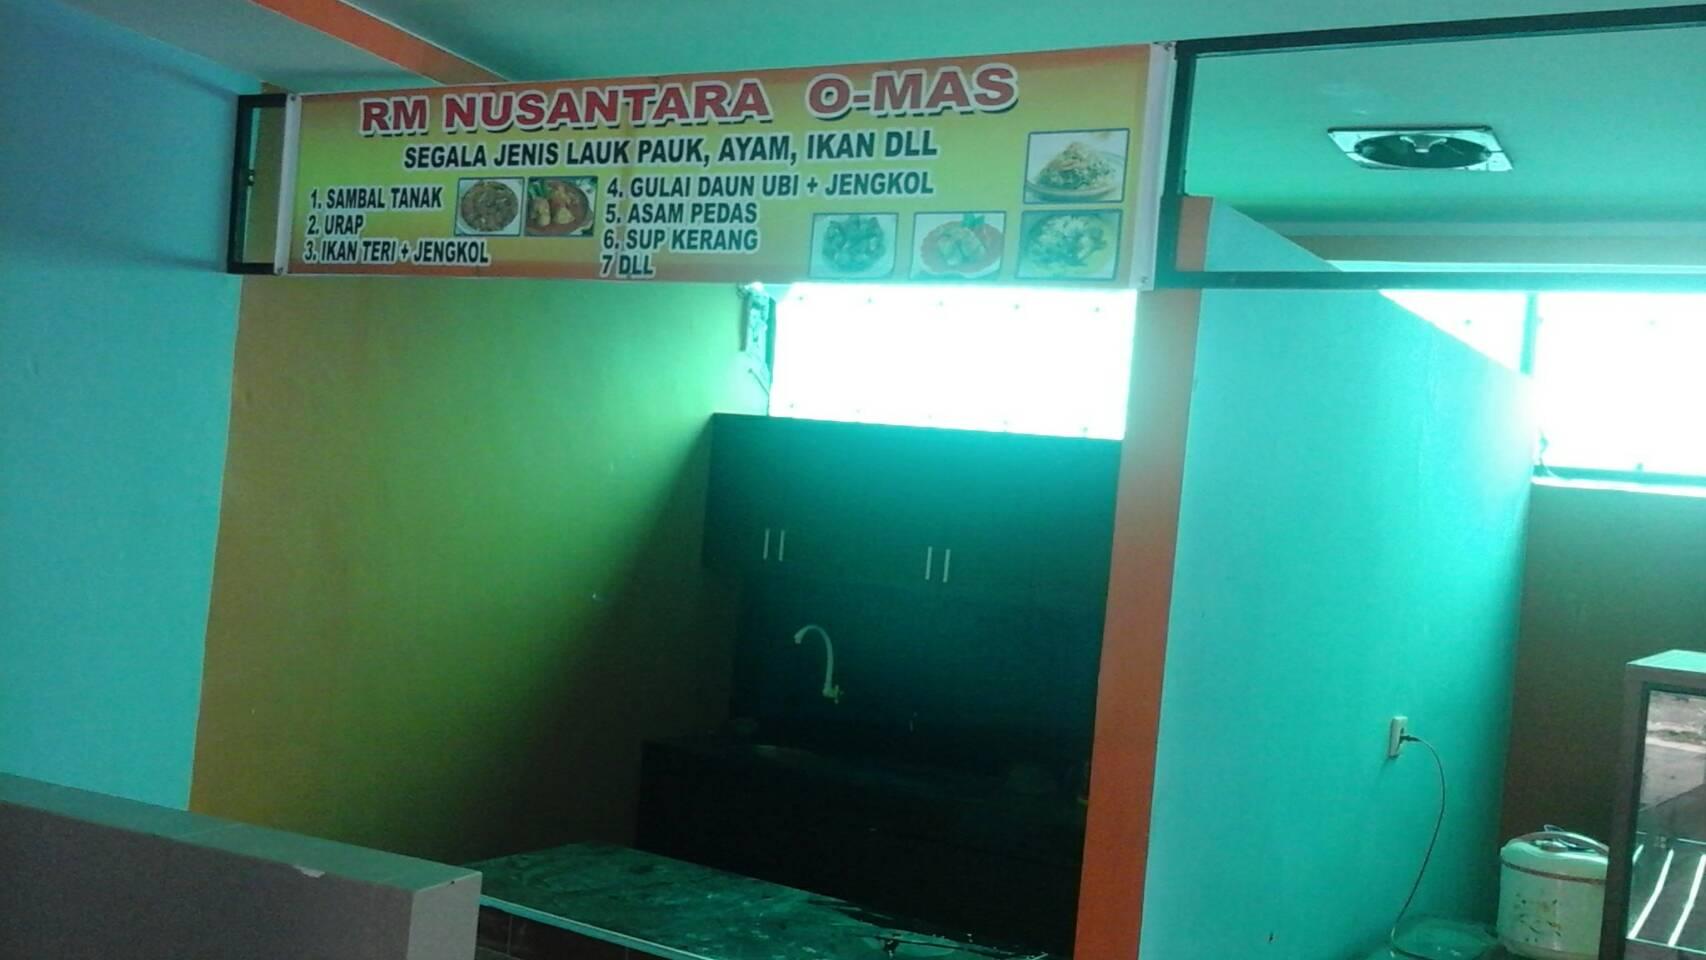 1504062133433 - Usaha Foodcourt And Coffee, Tempat Nongkrong Pekanbaru